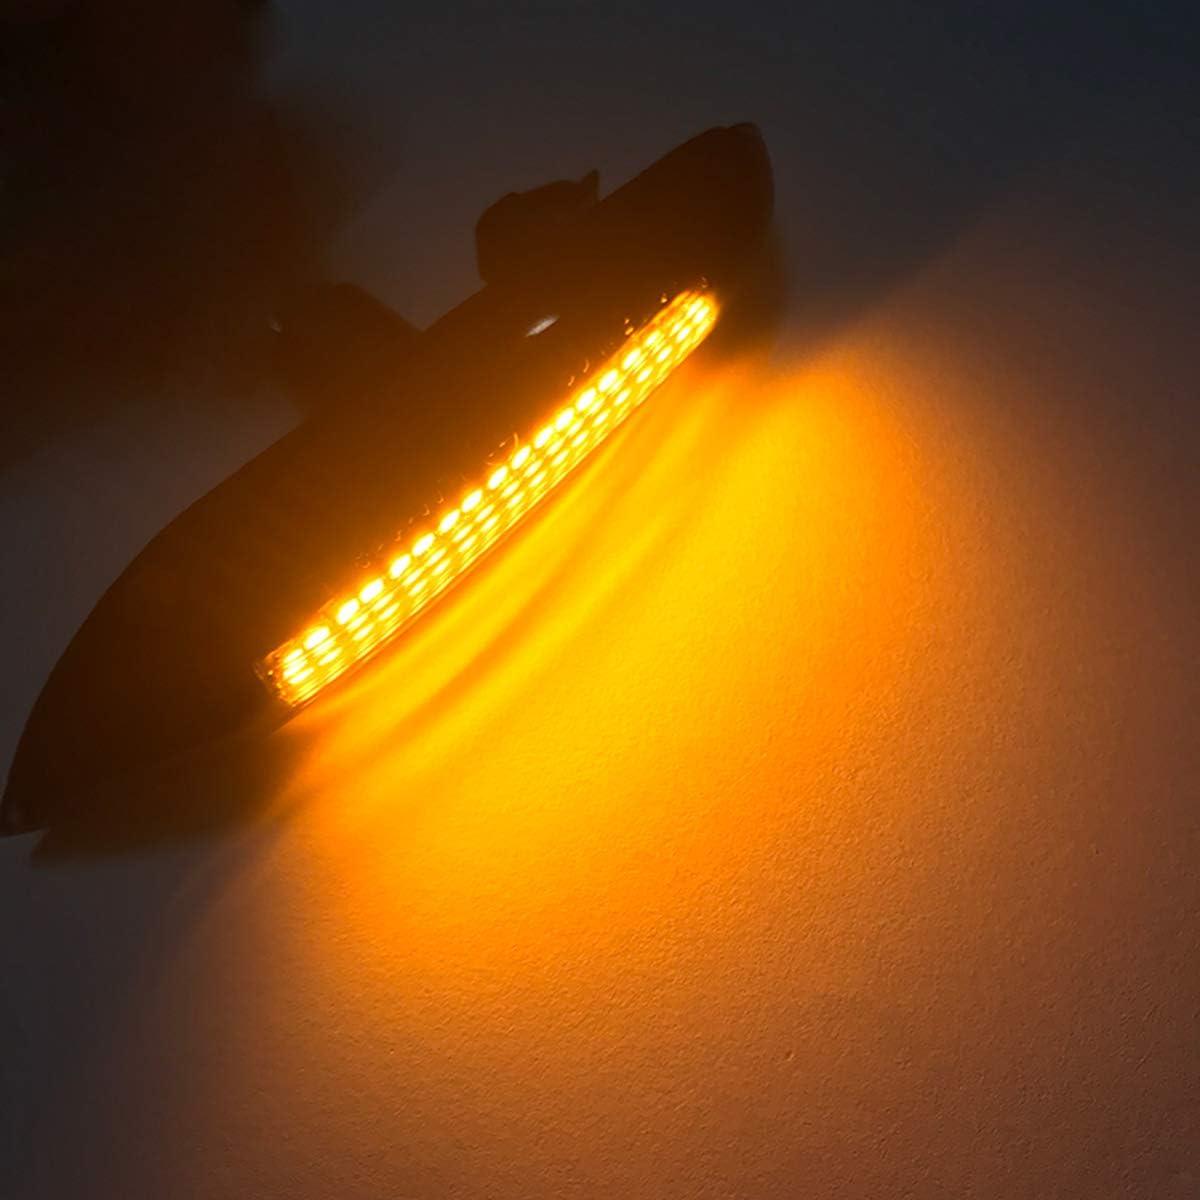 ROSEBEAR Paquete de 2 12V 5W L/ámpara Din/ámica Secuencial de Luz Lateral Ahumada para E92 E93 X1 E84 X3 E83 X5 E53 E46 E36 E90 E91 E60 E61 E81 E82 E87 E88